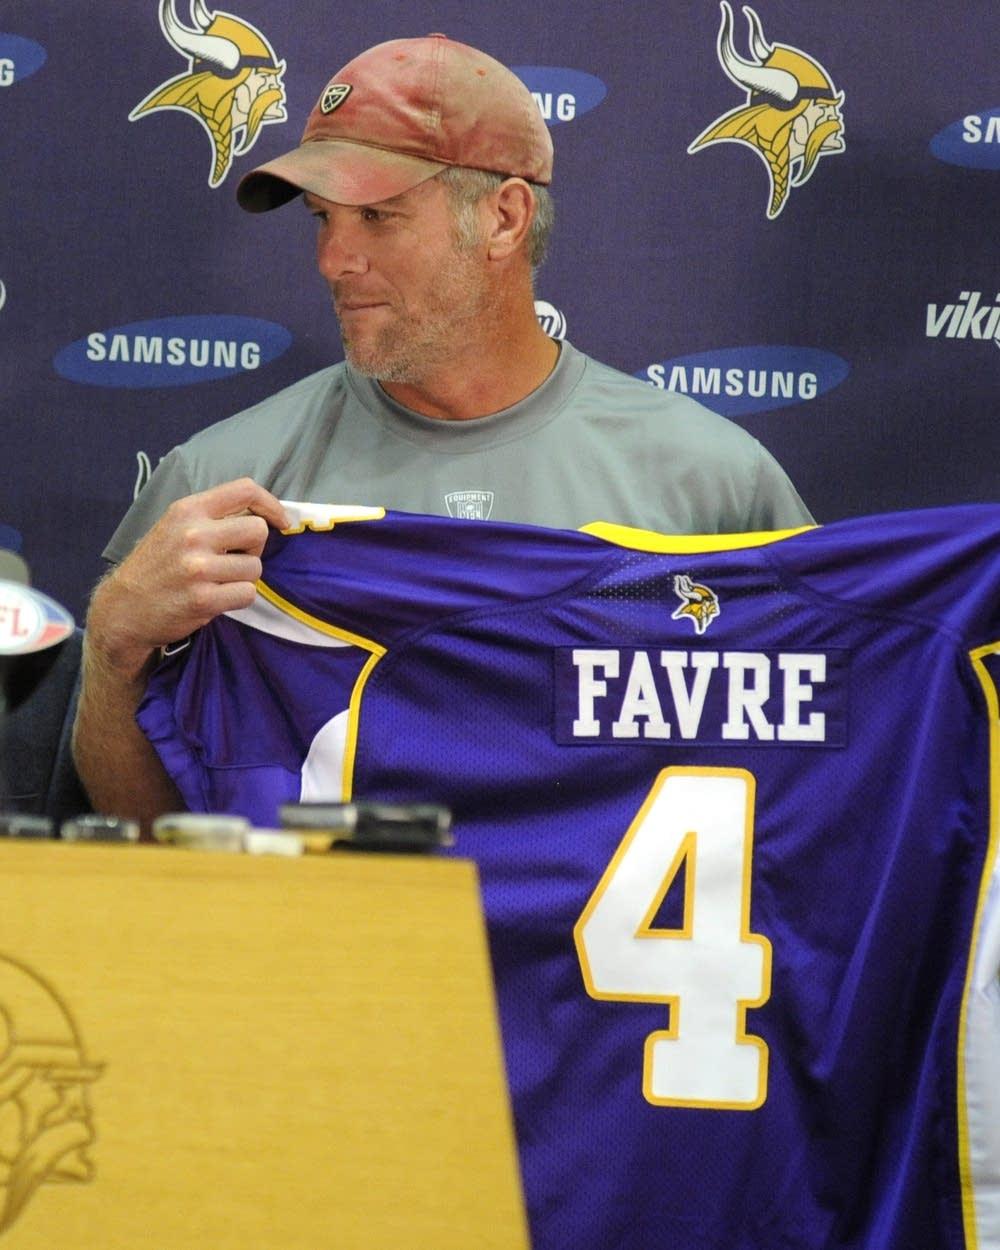 wholesale dealer 34e37 2e813 What retirement? Favre coming back with Vikings | MPR News